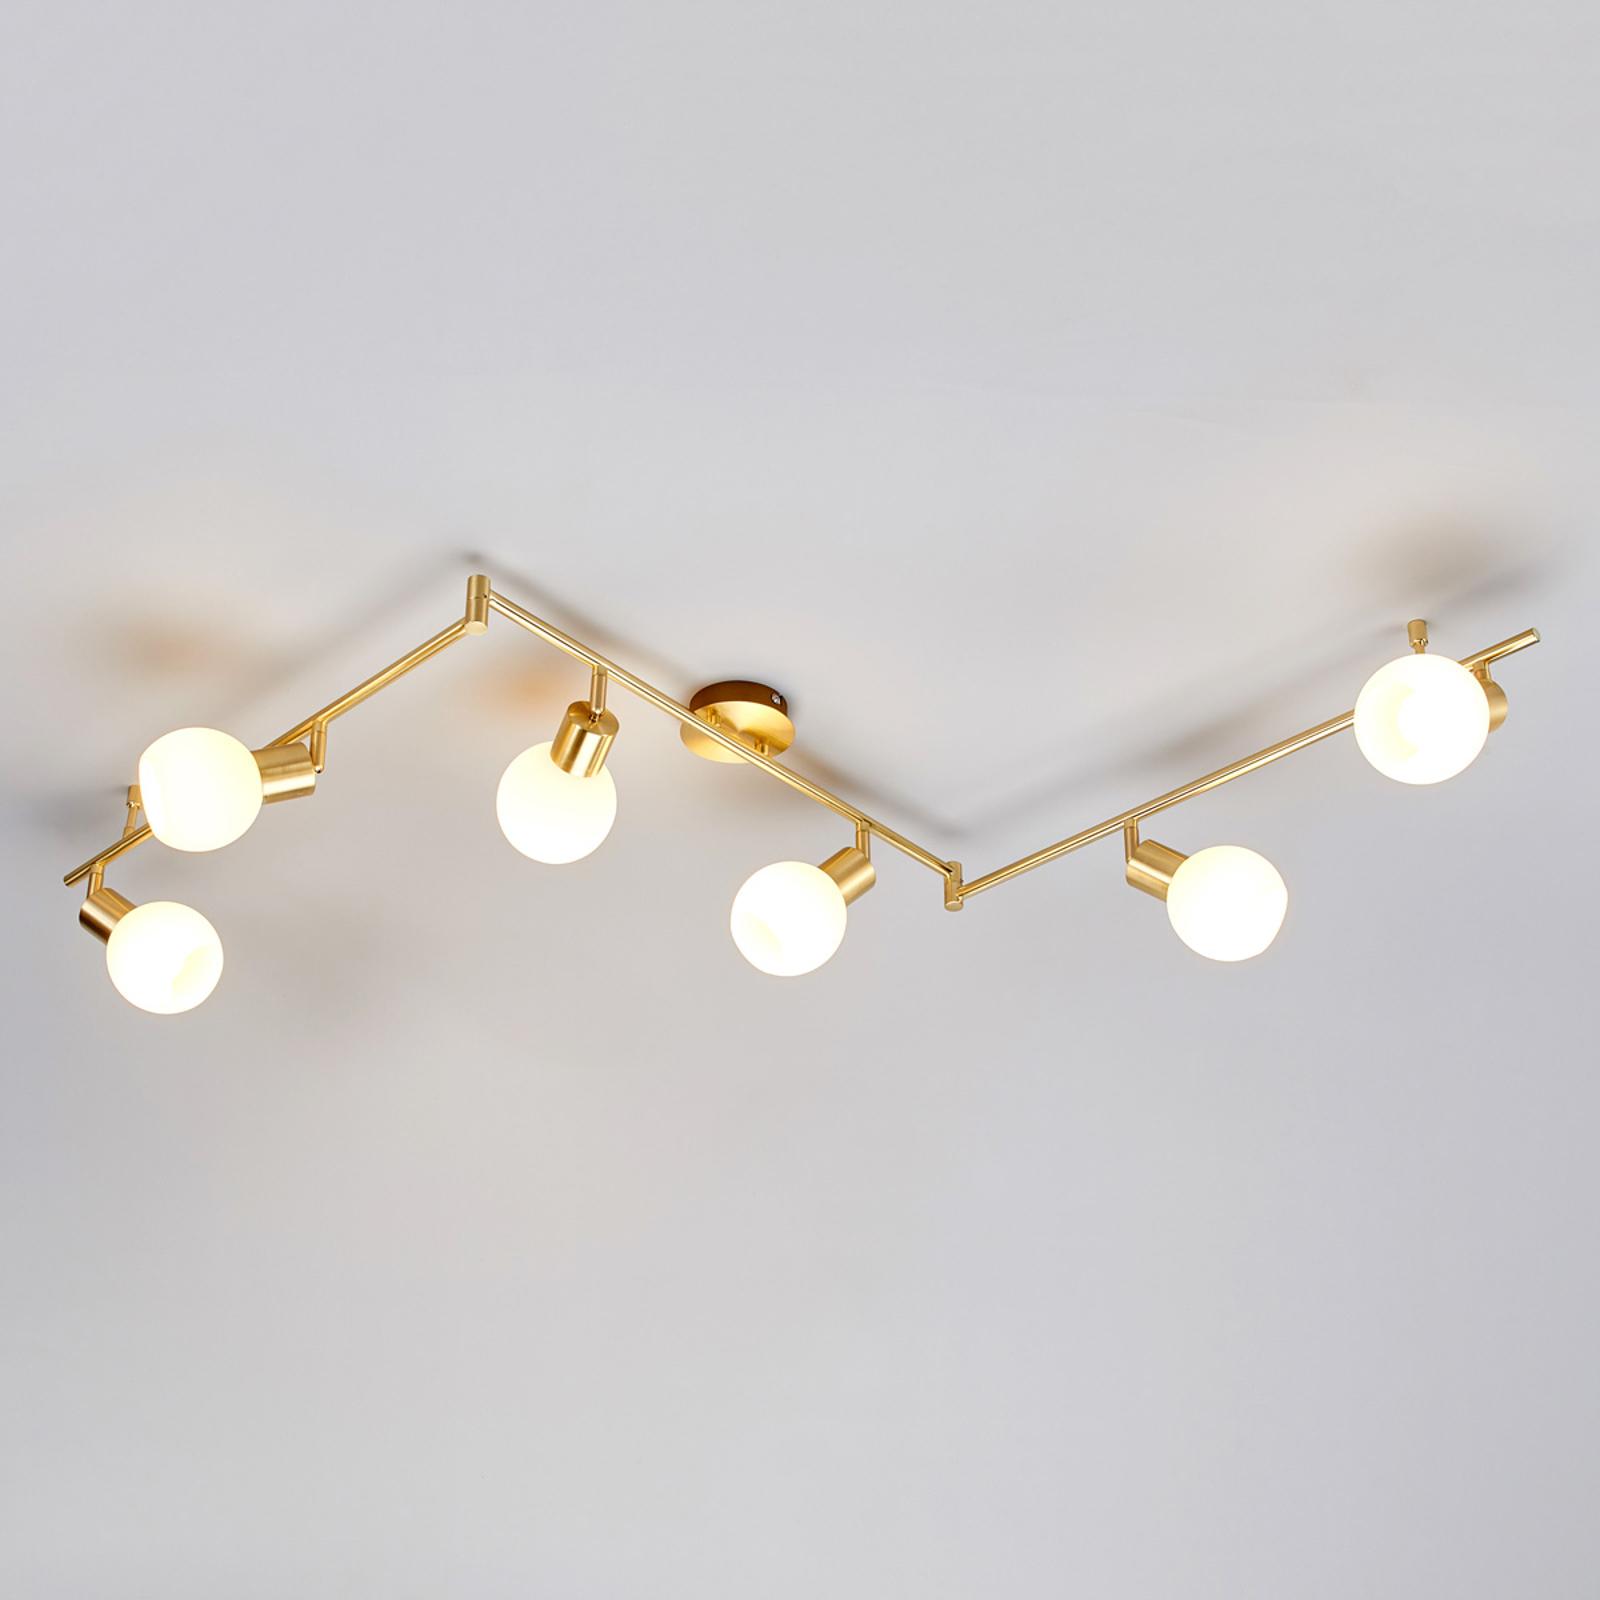 Plafonnier LED Elaina à 6 lampes, laiton